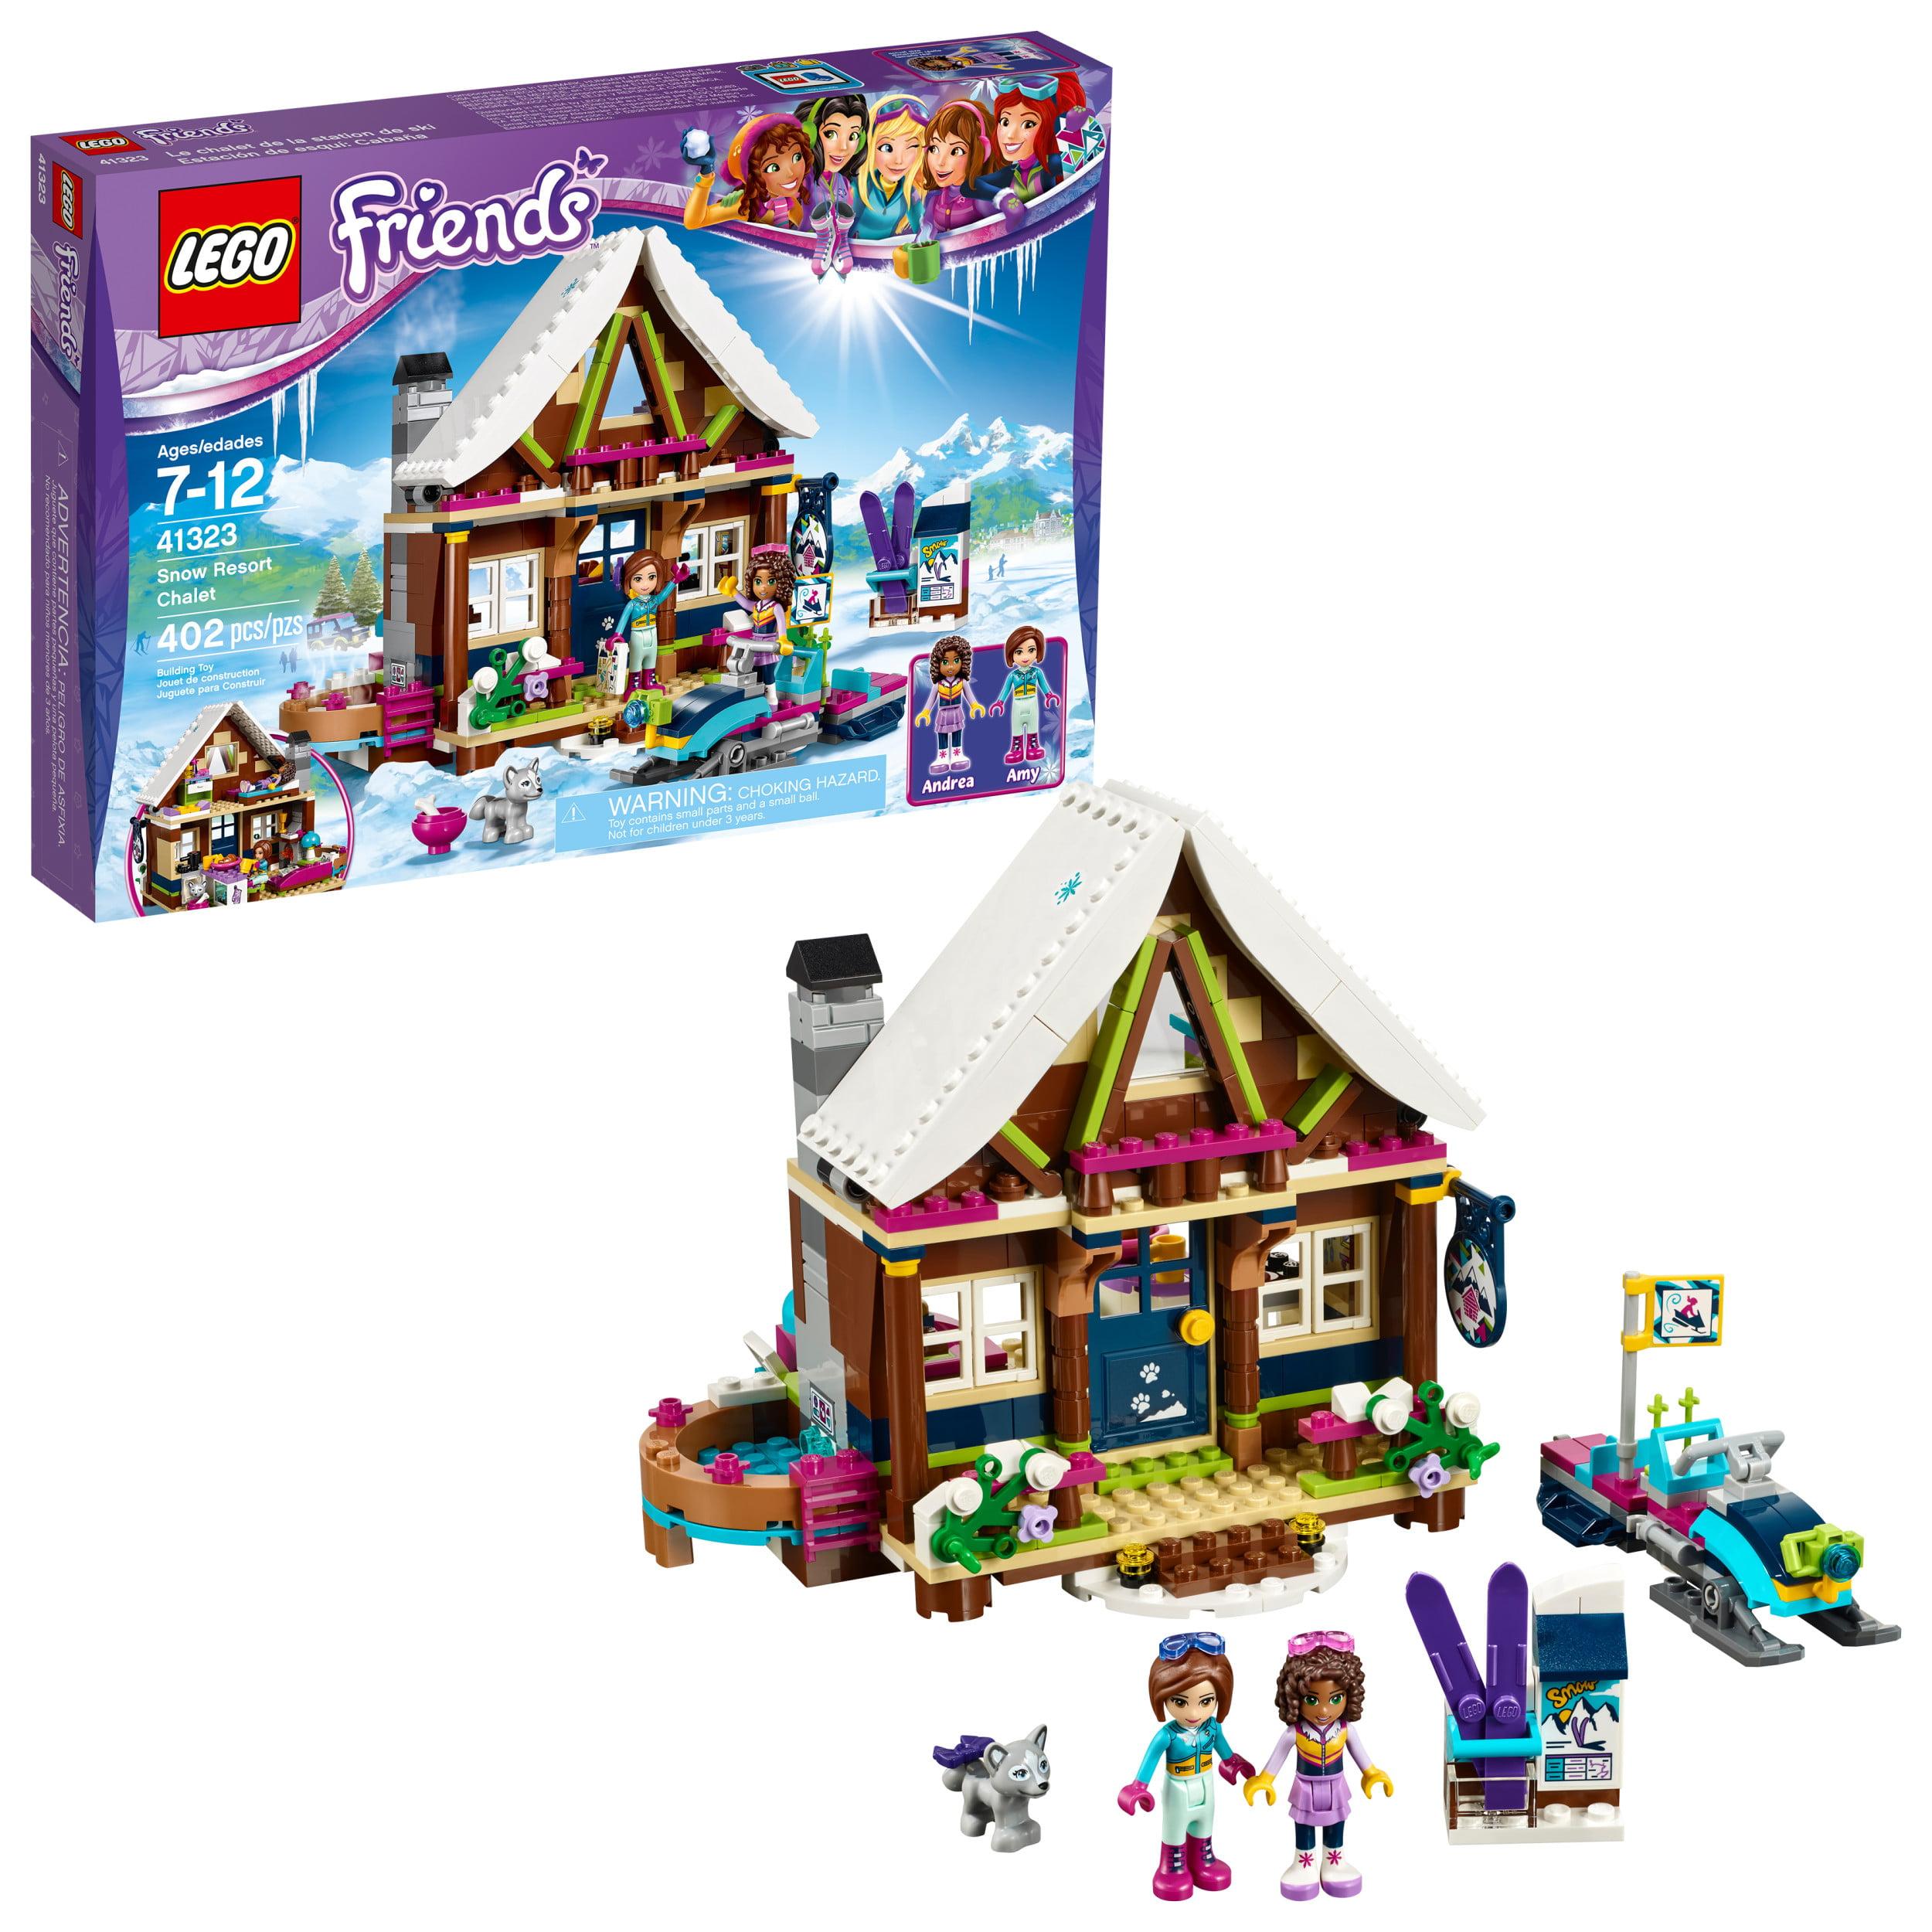 LEGO Friends Snow Resort Chalet 41323 - Walmart.com